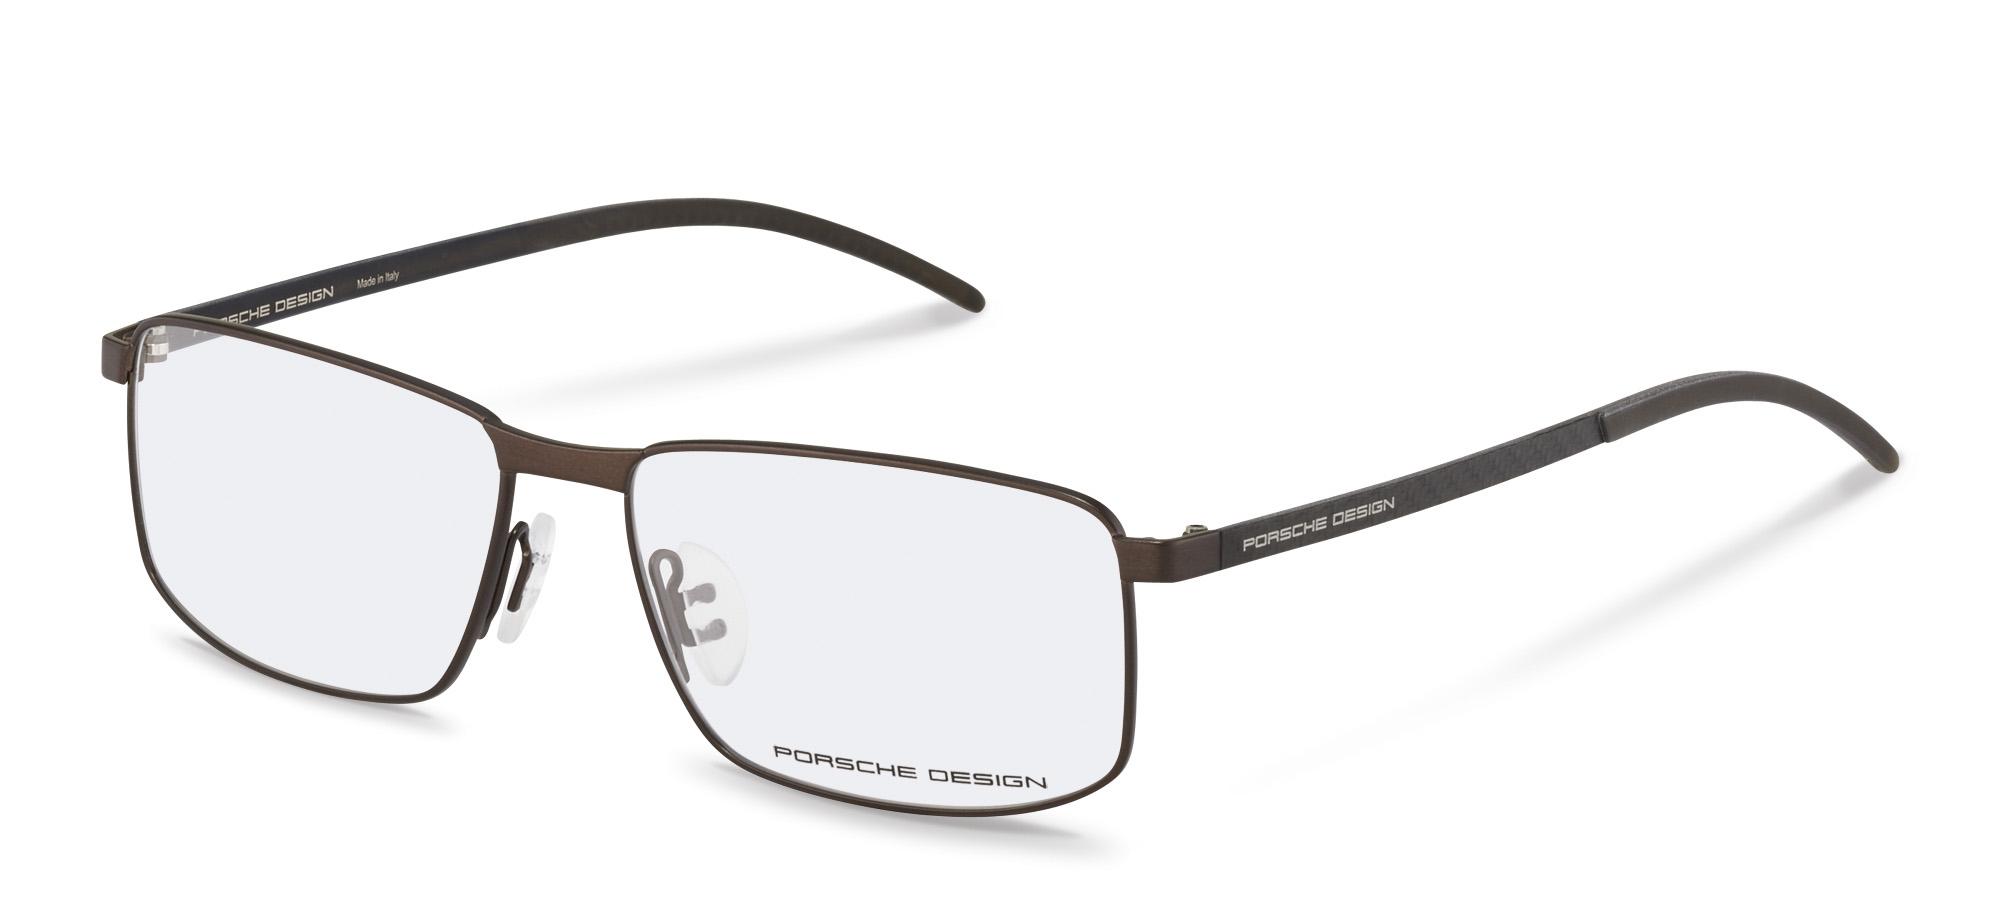 6328ad1d5e9c Porsche Design-Ophthalmic frame-P8340-black